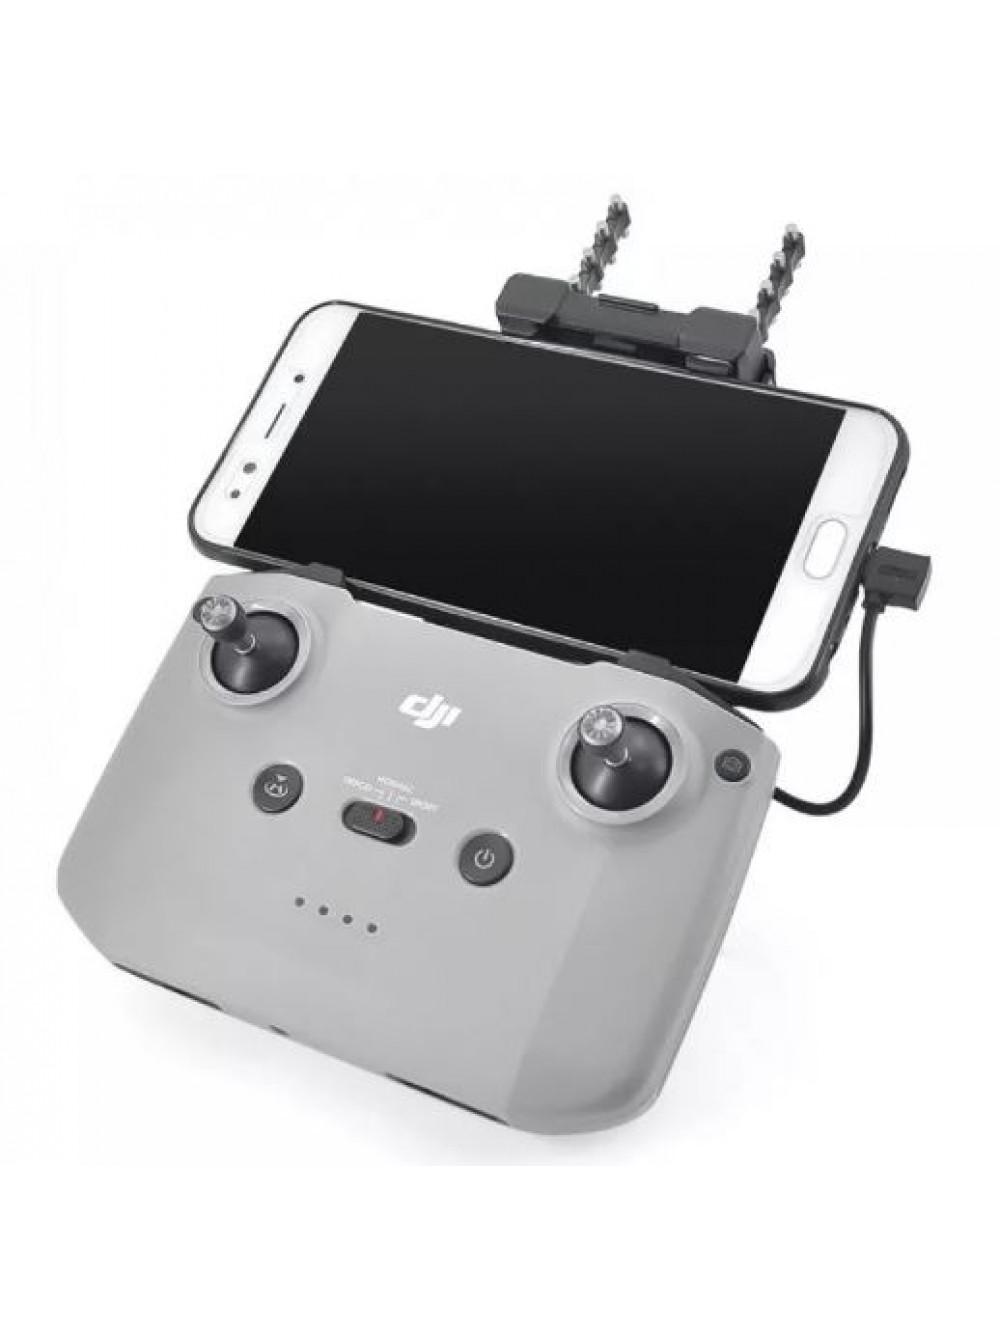 STARTRC 5,8 ГГц усилитель сигнала Yagi-Uda для DJI Mini 2 / Air / Air 2